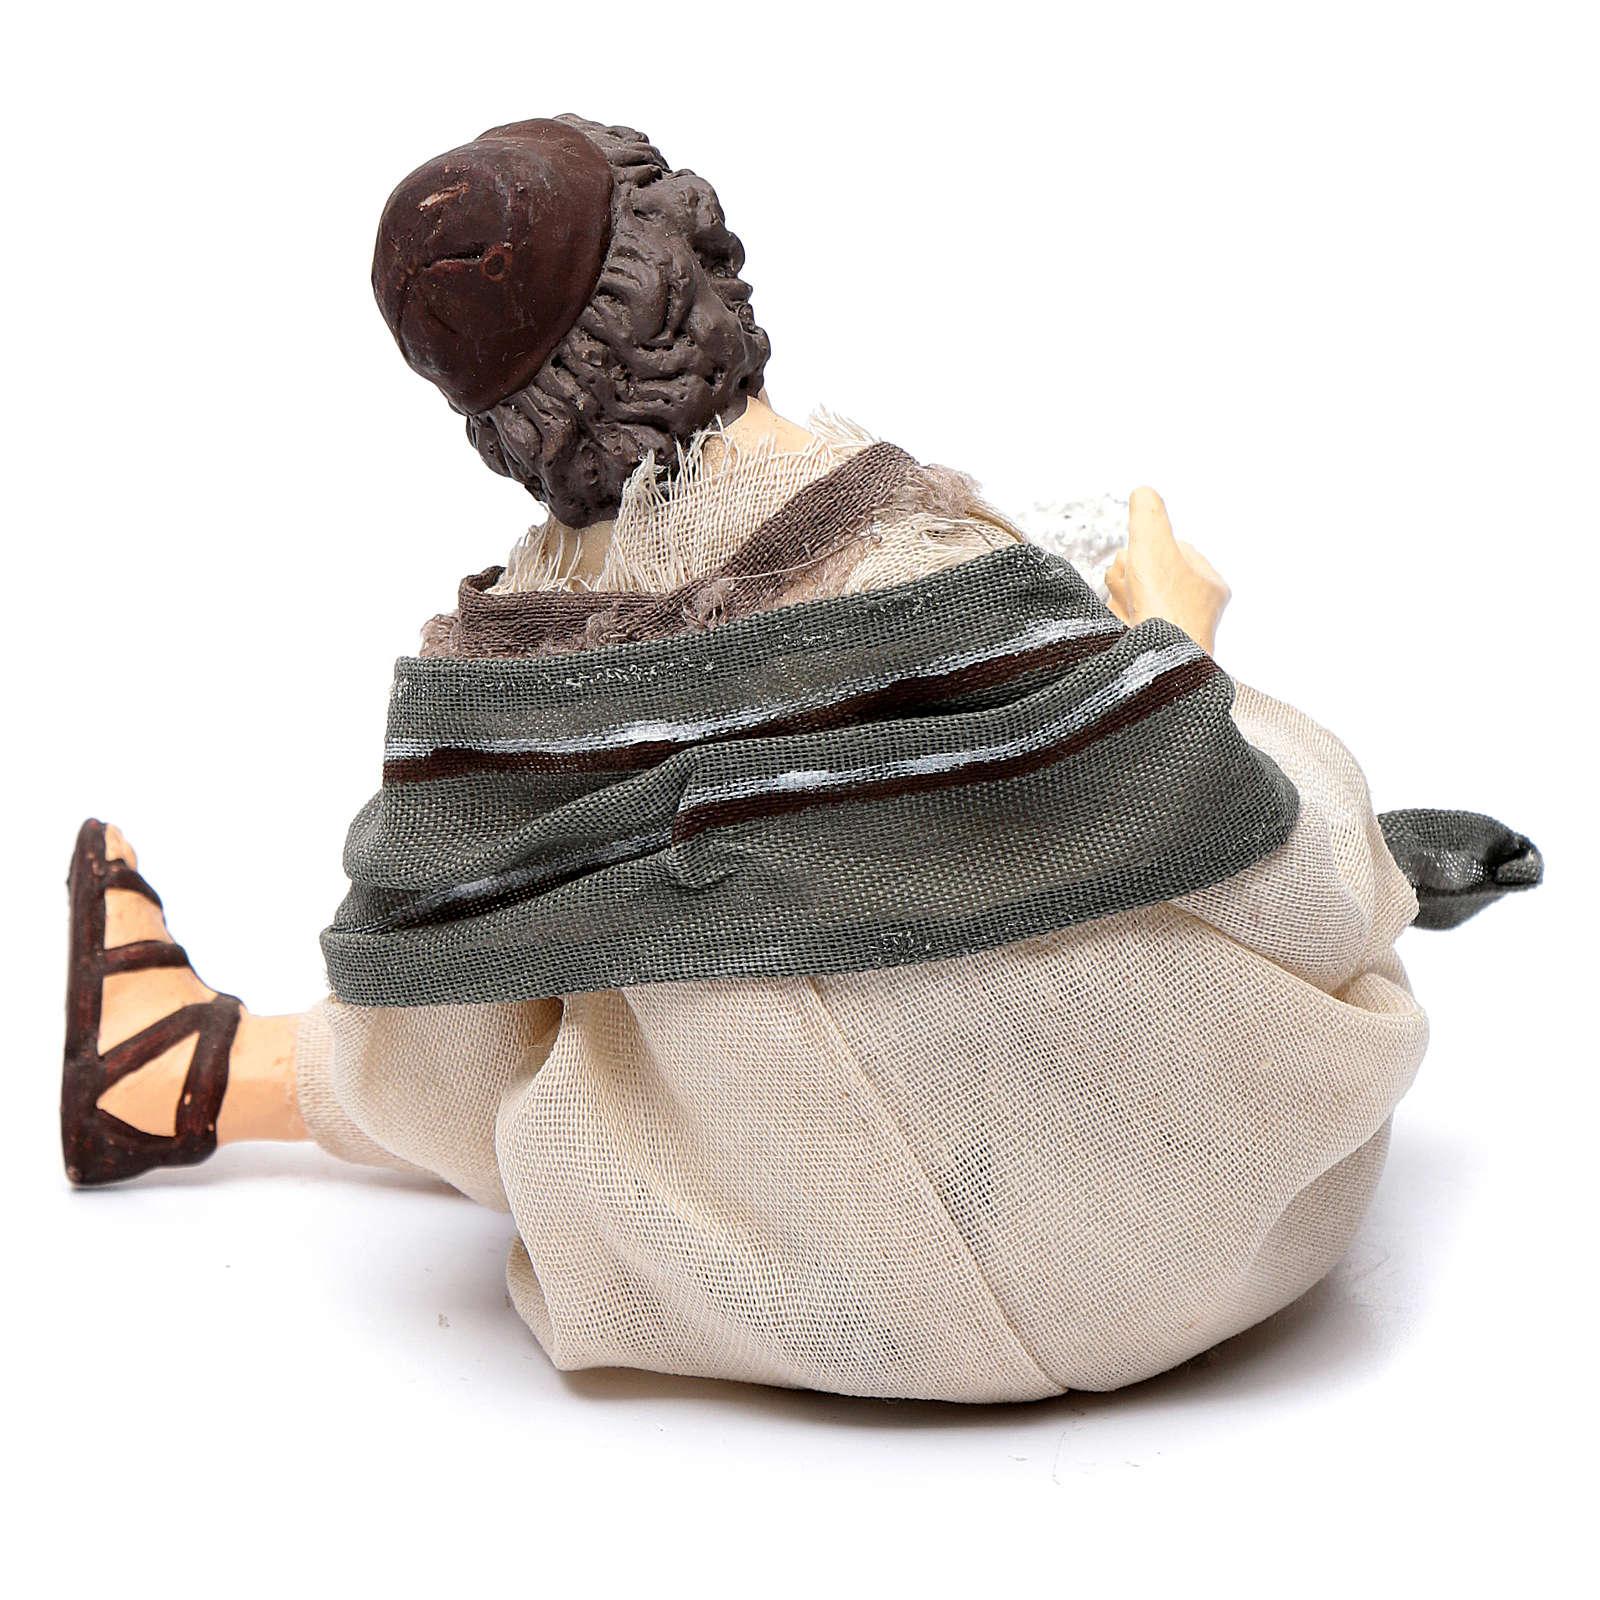 Pastor para belén sentado con oveja 15 cm resina 3